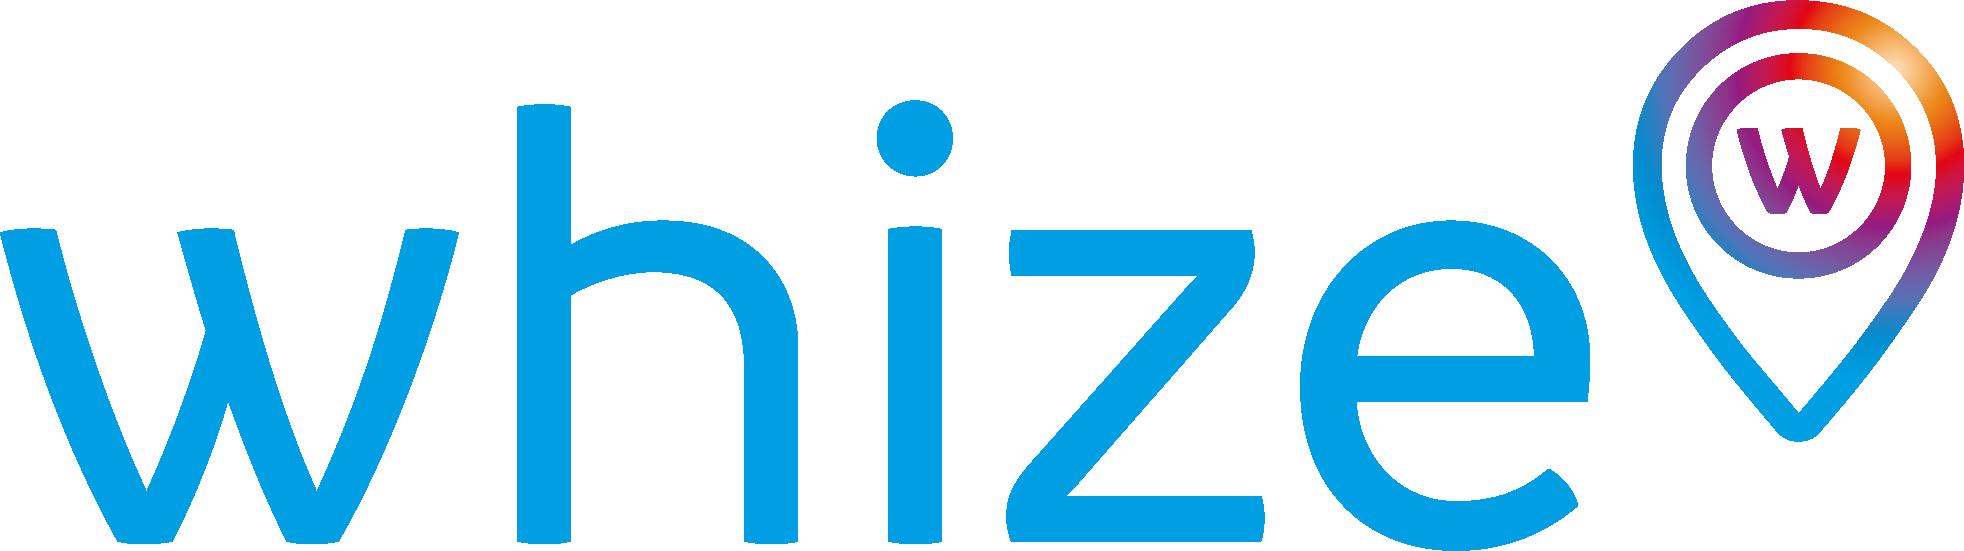 Whize_Logo_Fullcolor_RGB.png